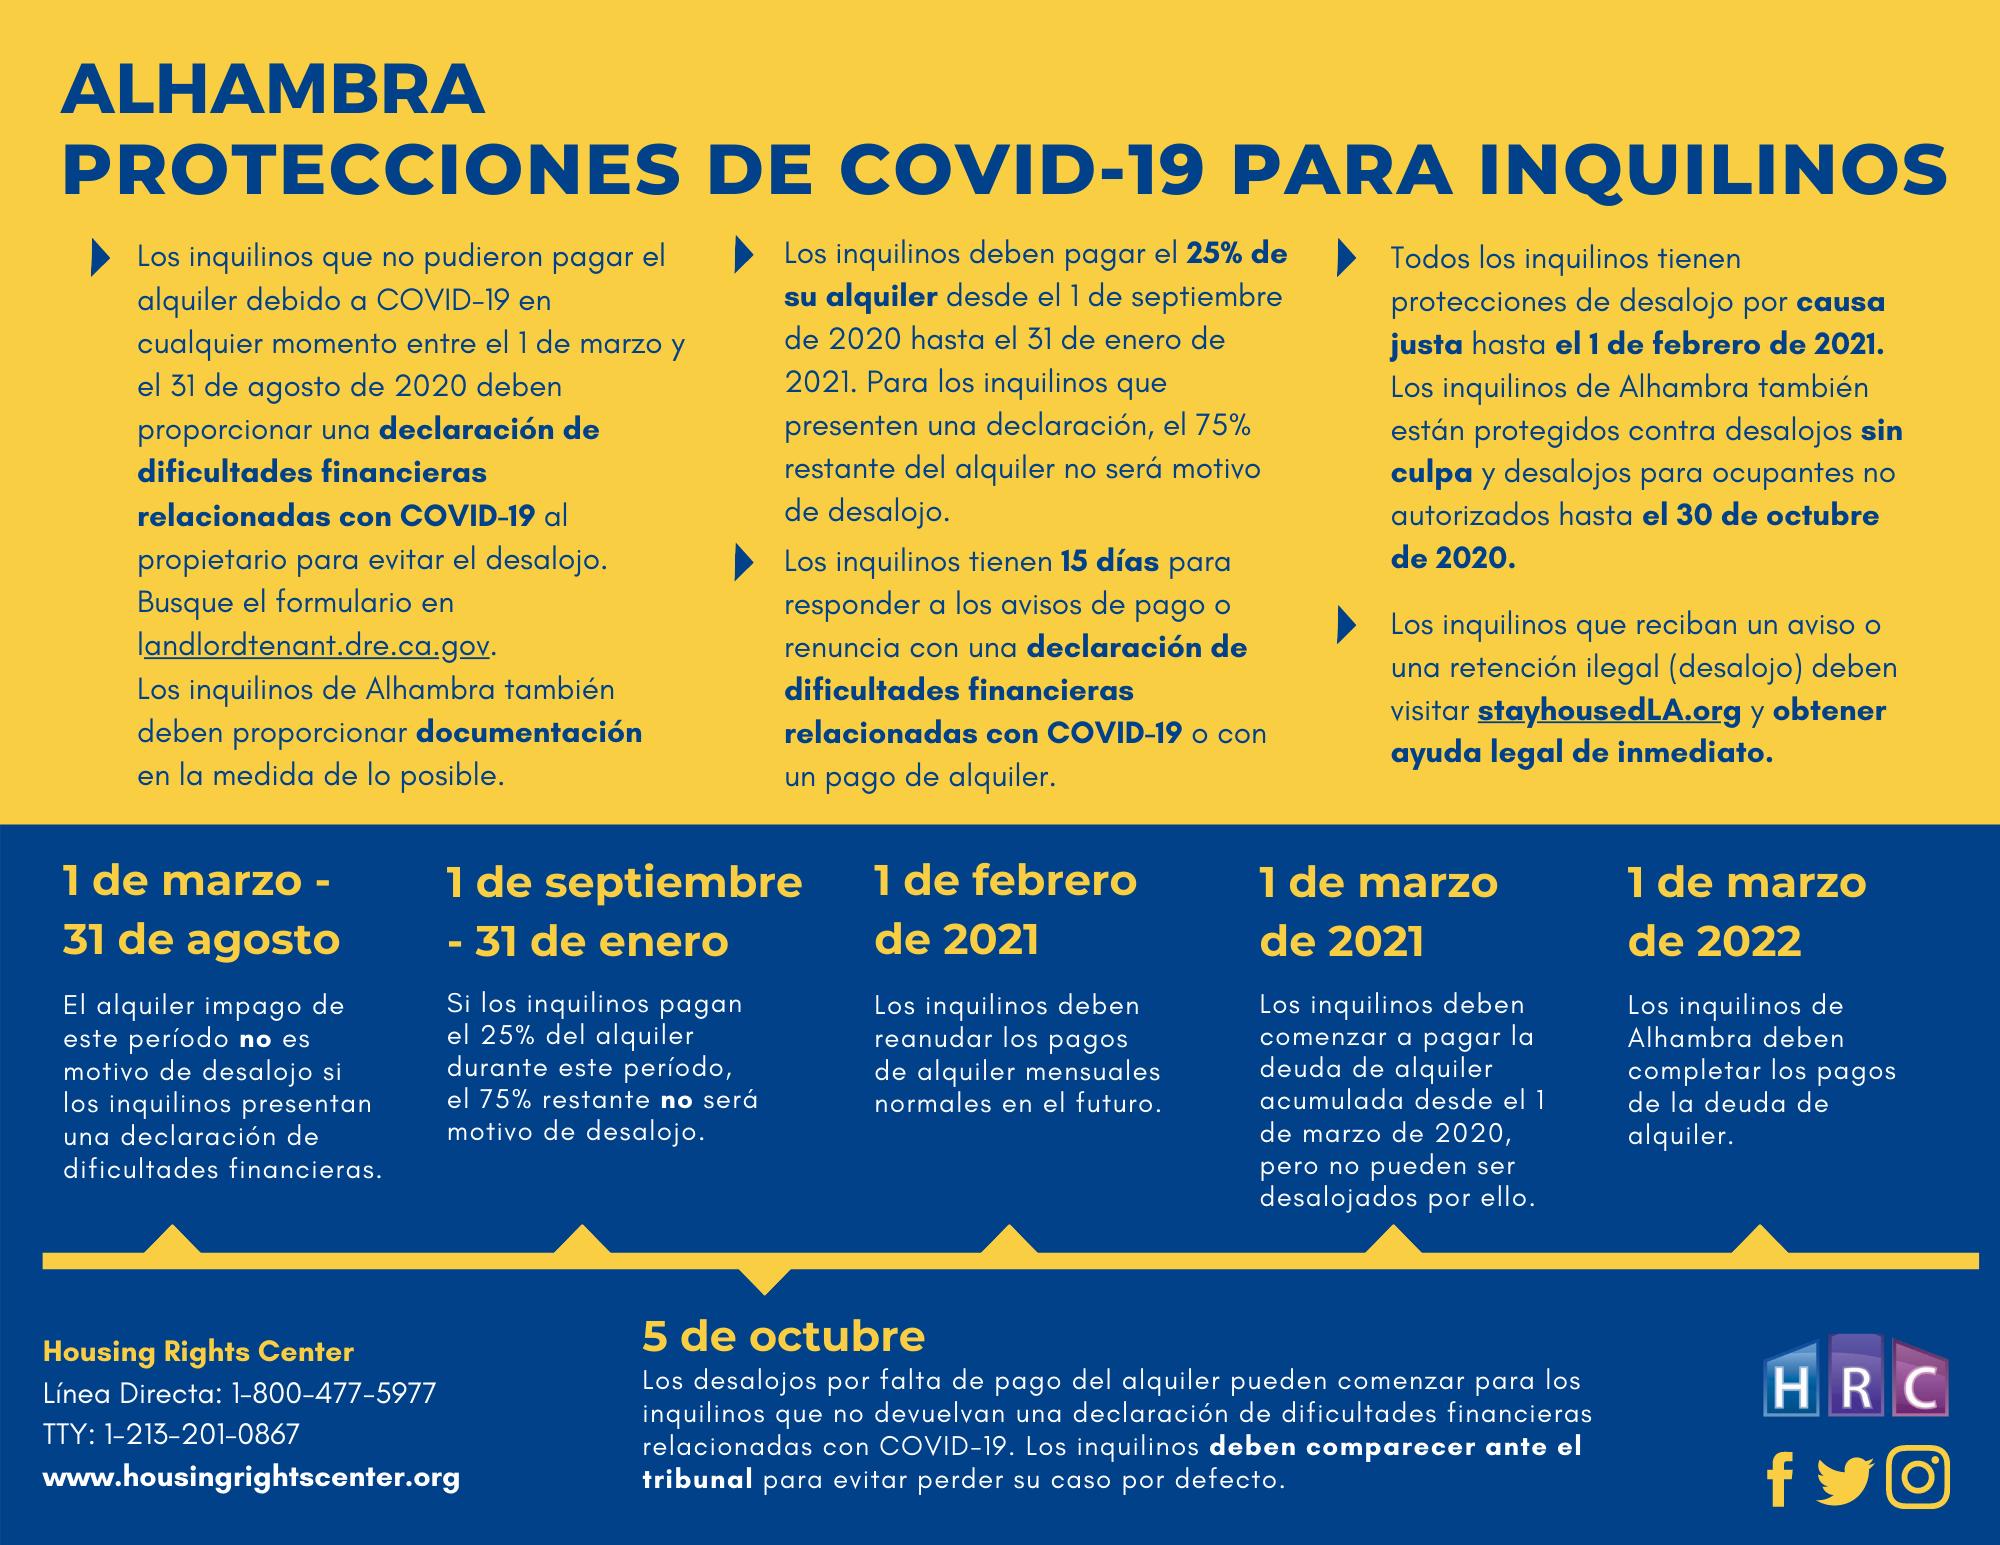 AB3088 information in Spanish